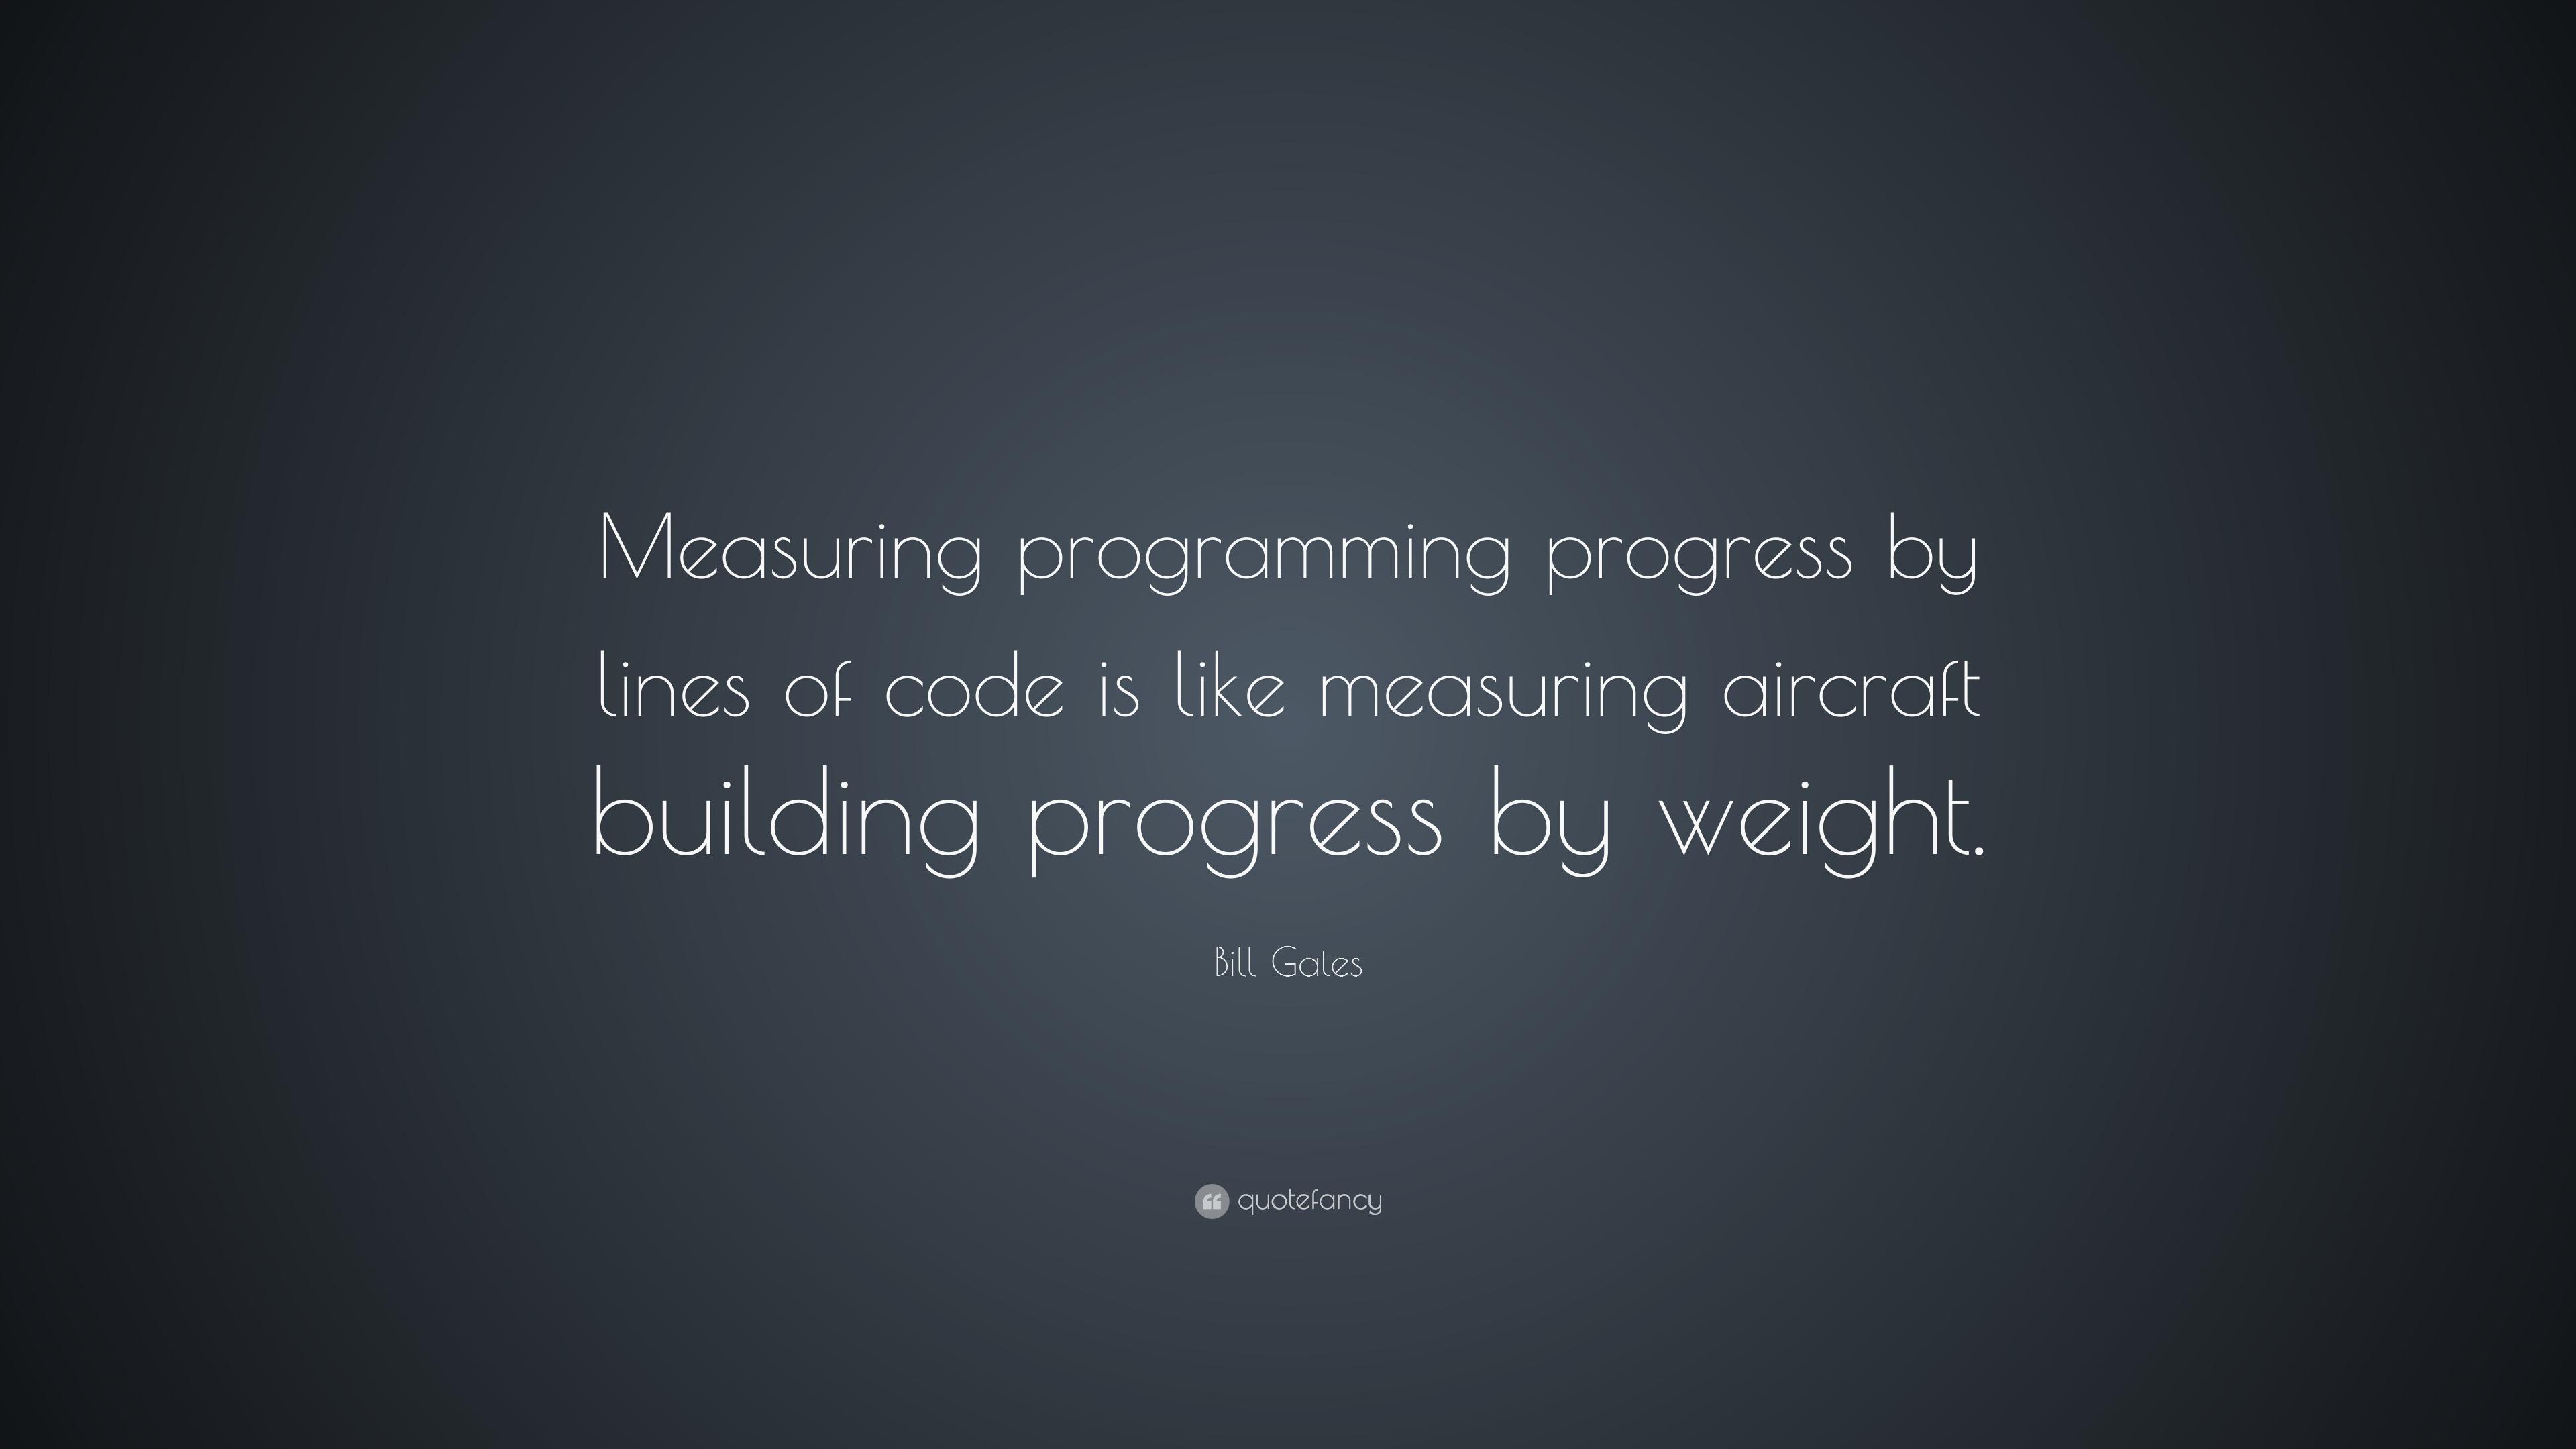 Bill Gates Measuring Programming Progress By Lines Of Code Is Like Mea...